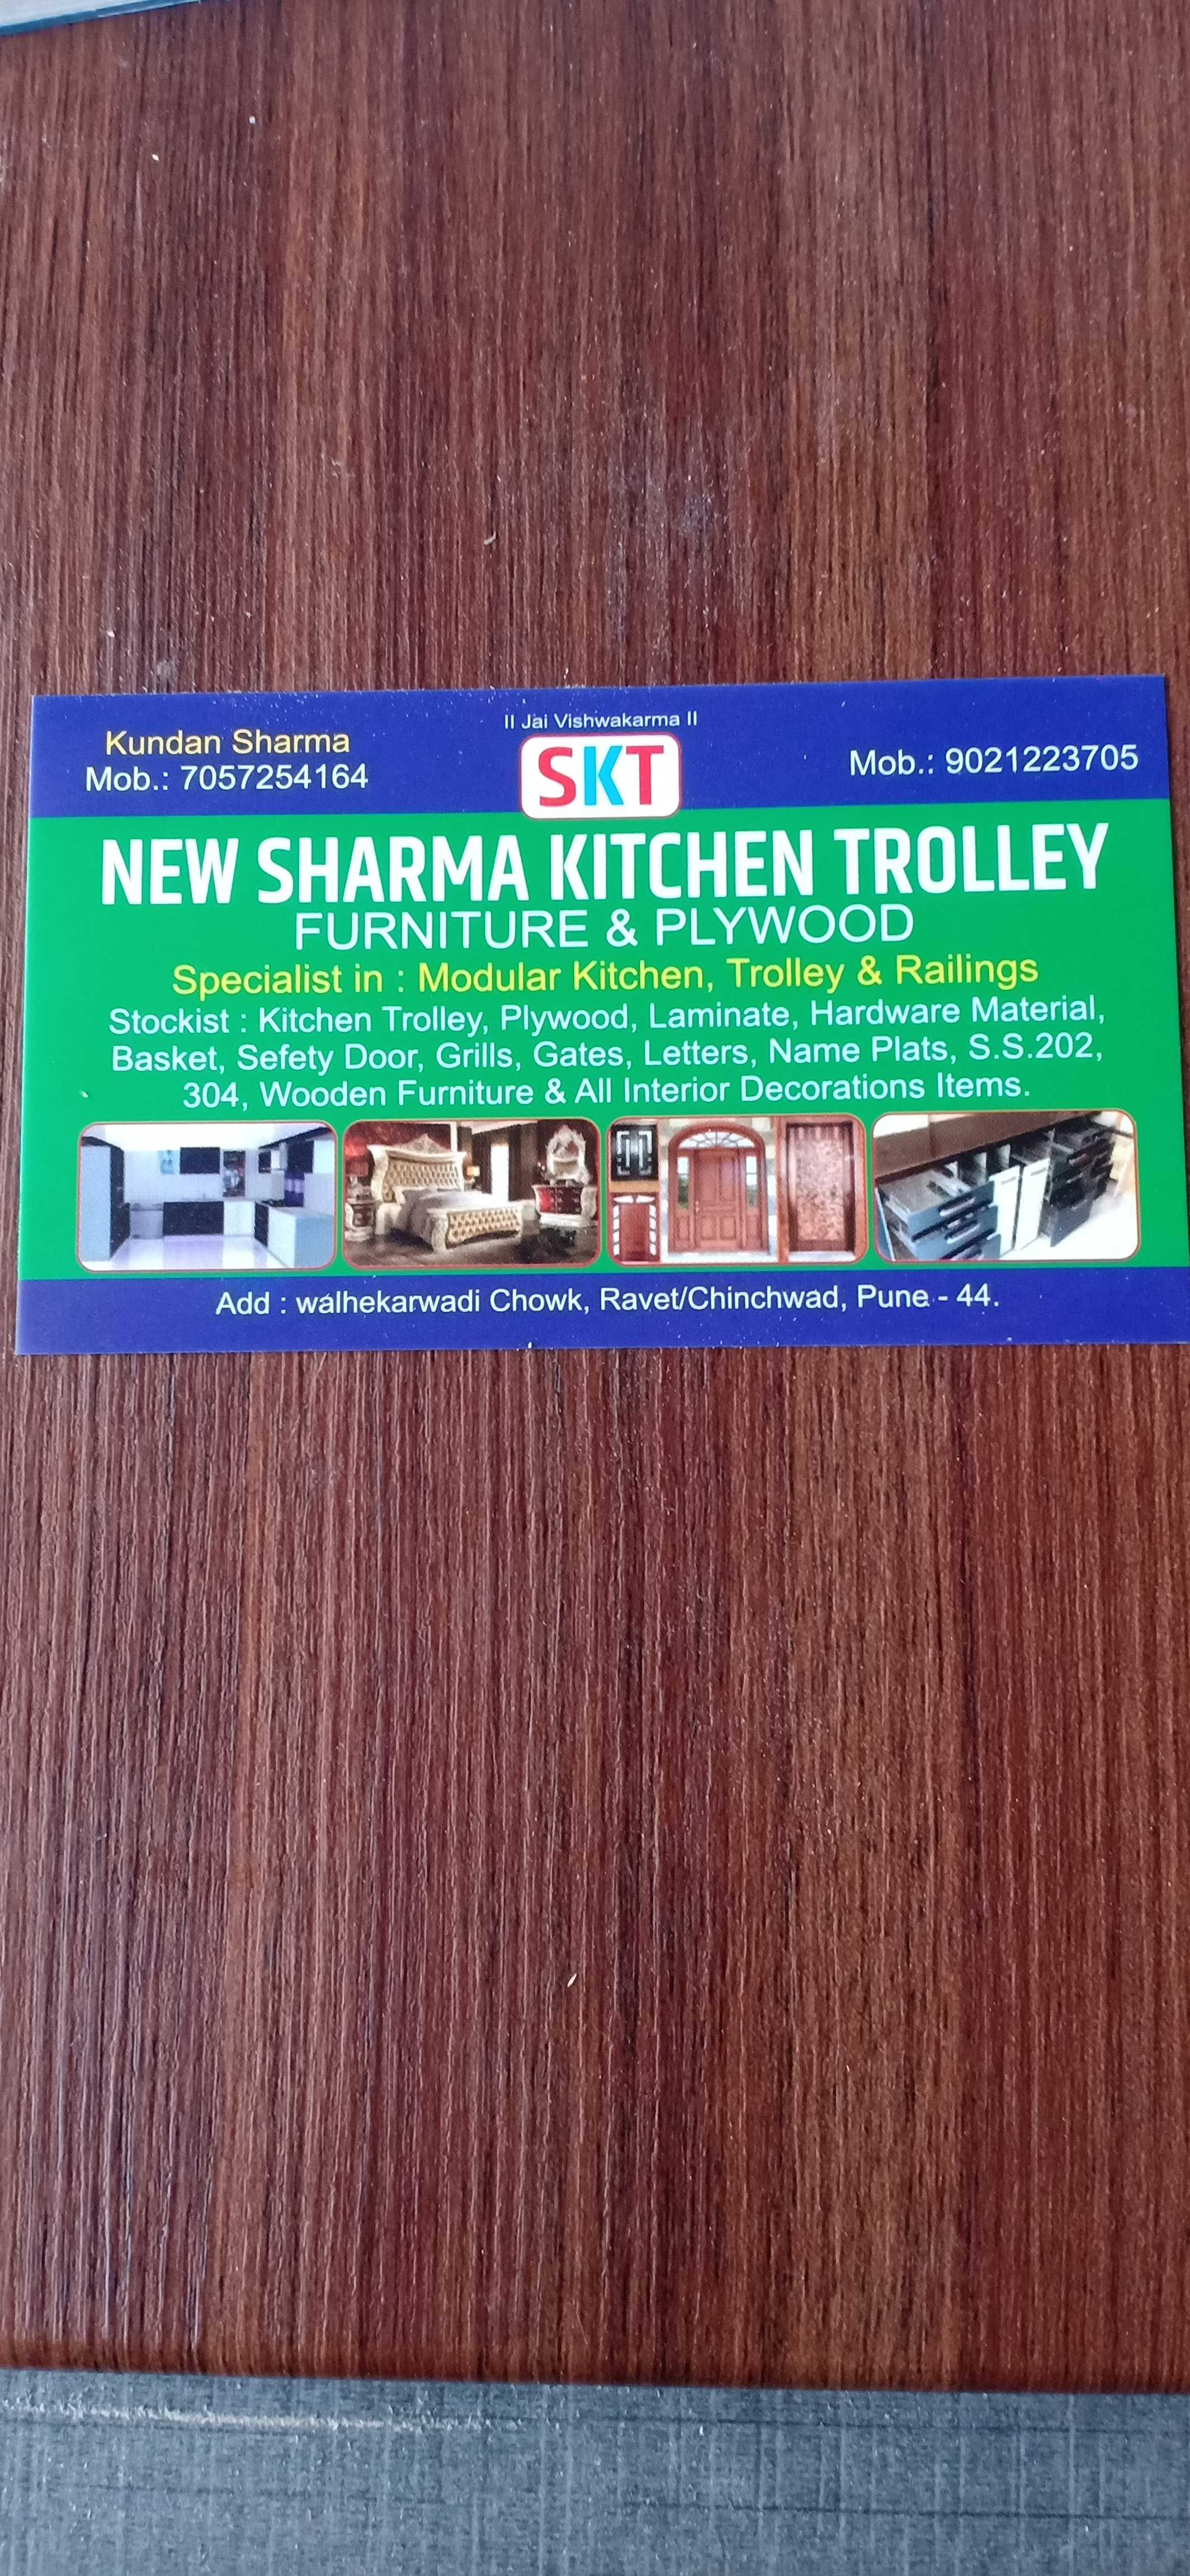 New Sharma Kitchen Trolley in Pimpri